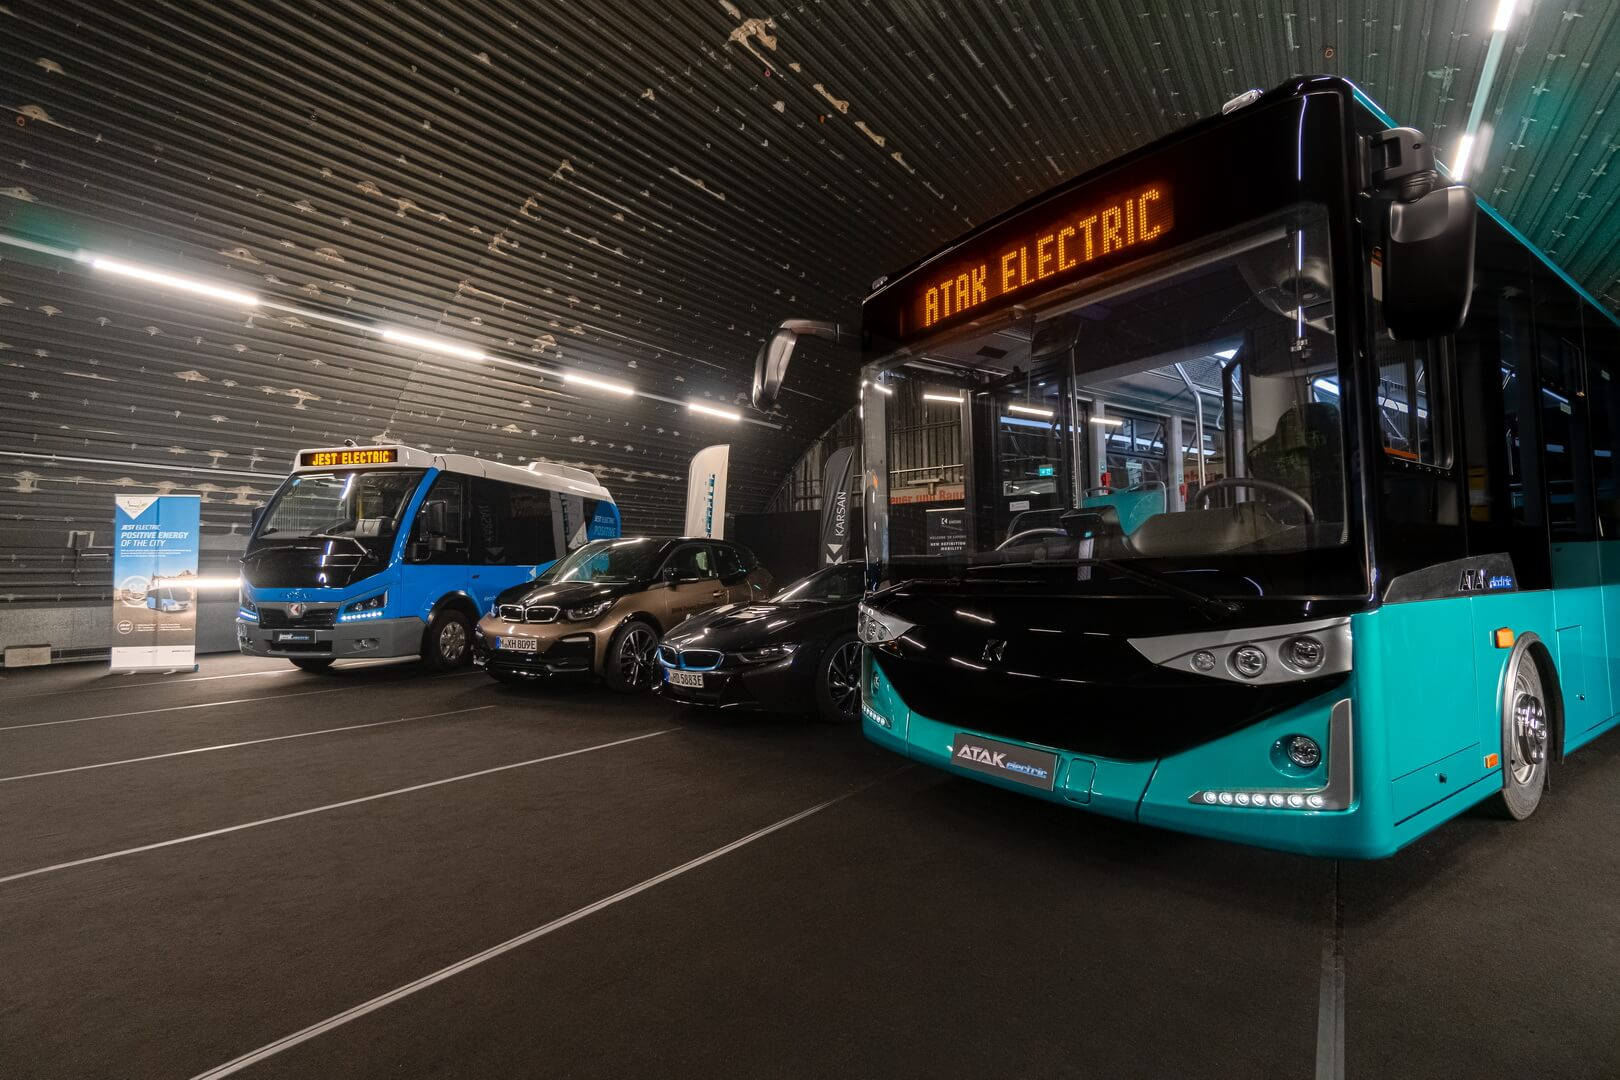 Электрические Jest Electric, BMW i3, BMW i8 PHEV и Atak Electric